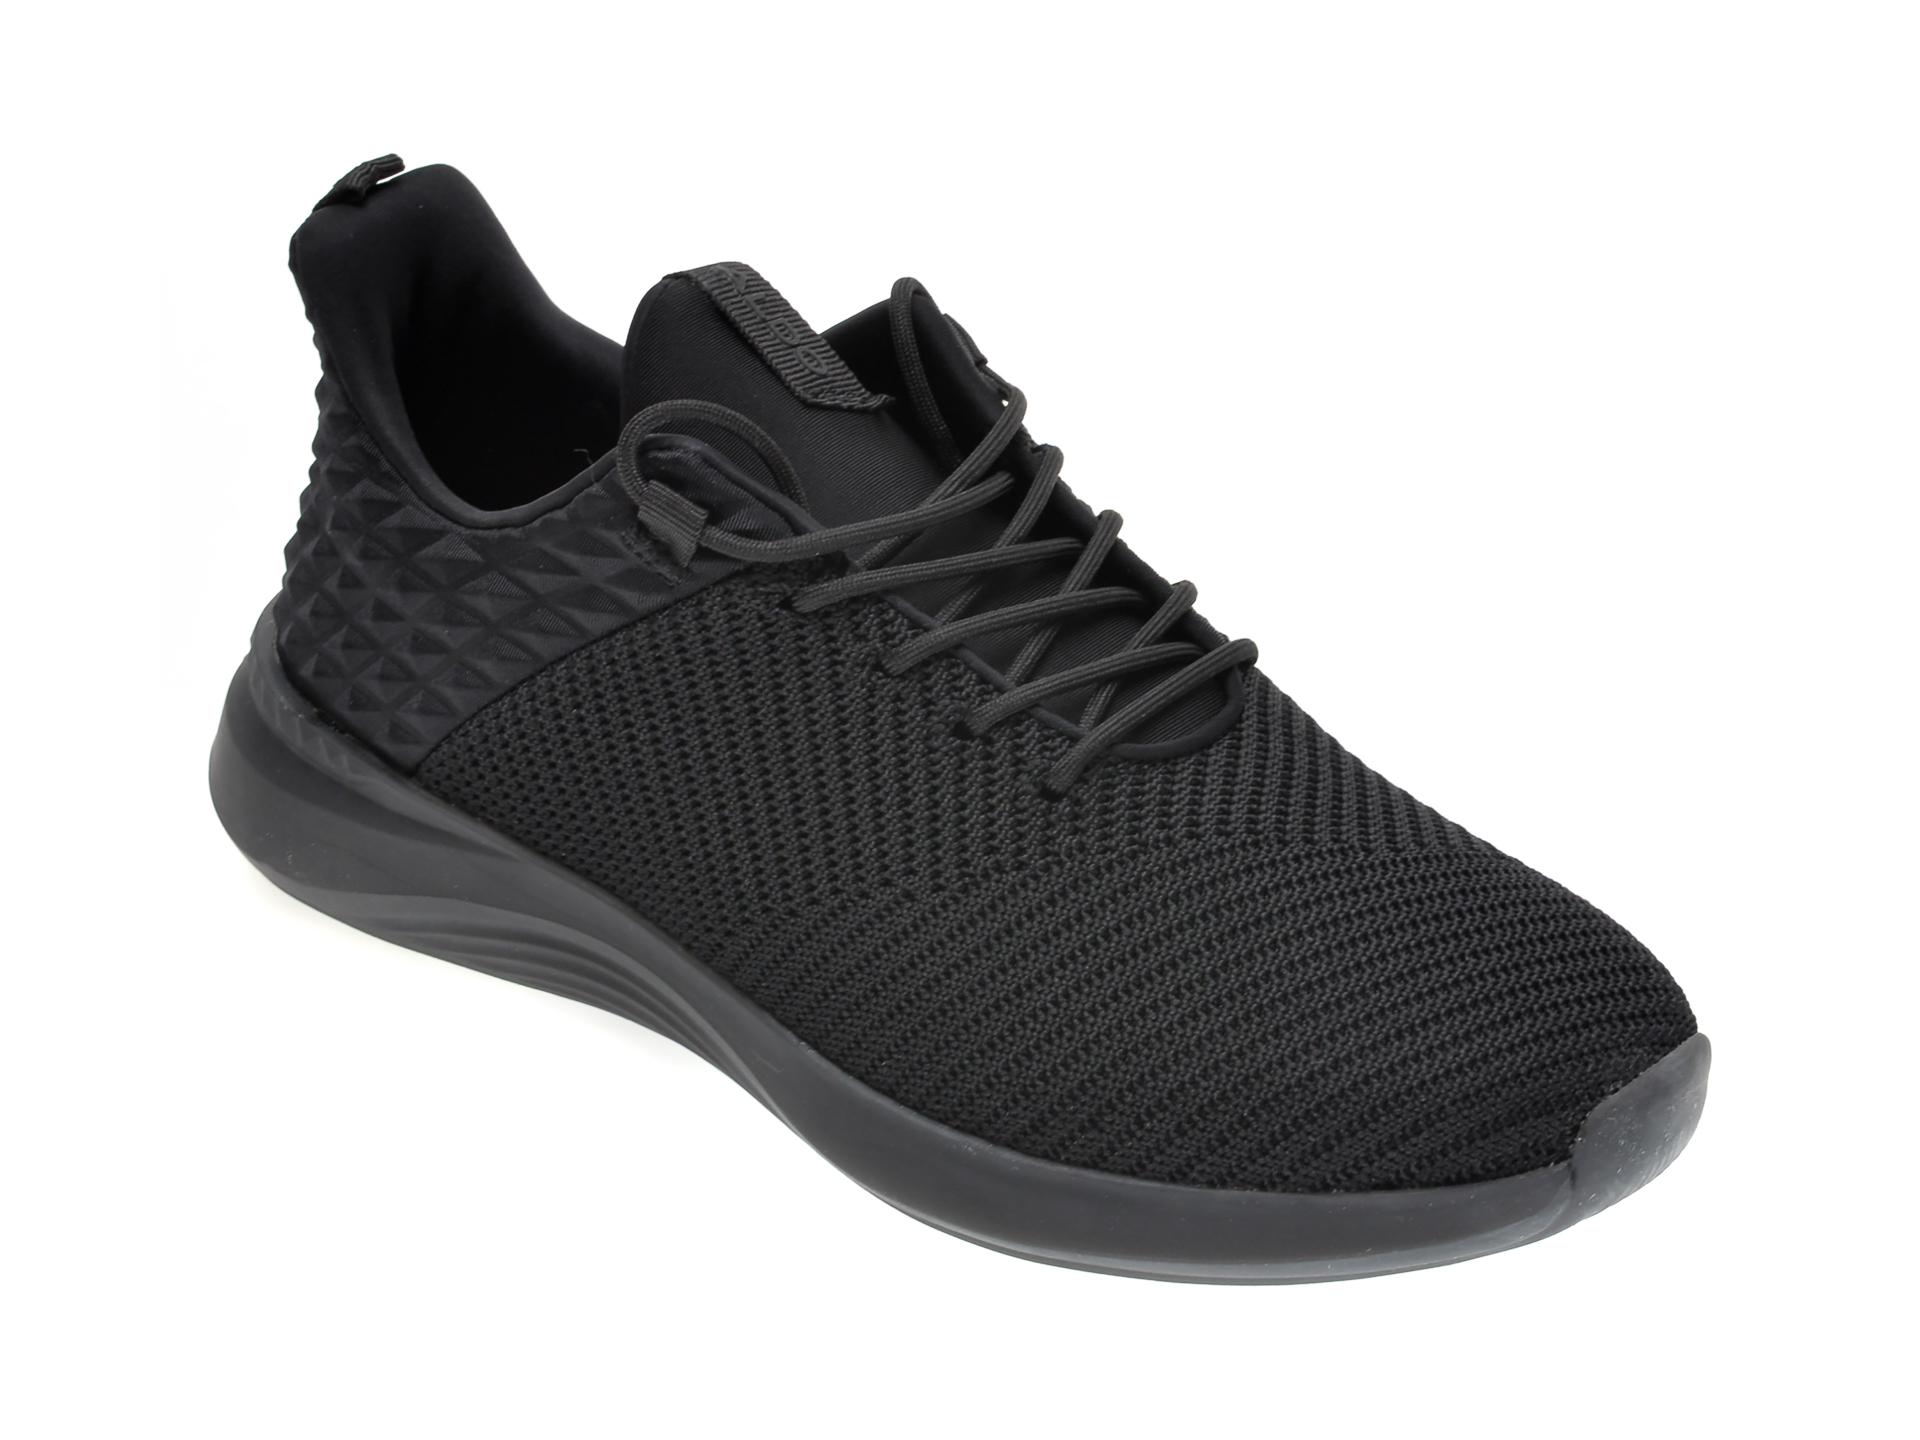 Pantofi sport ALDO negri, Rpplclear1B008, din material textil New